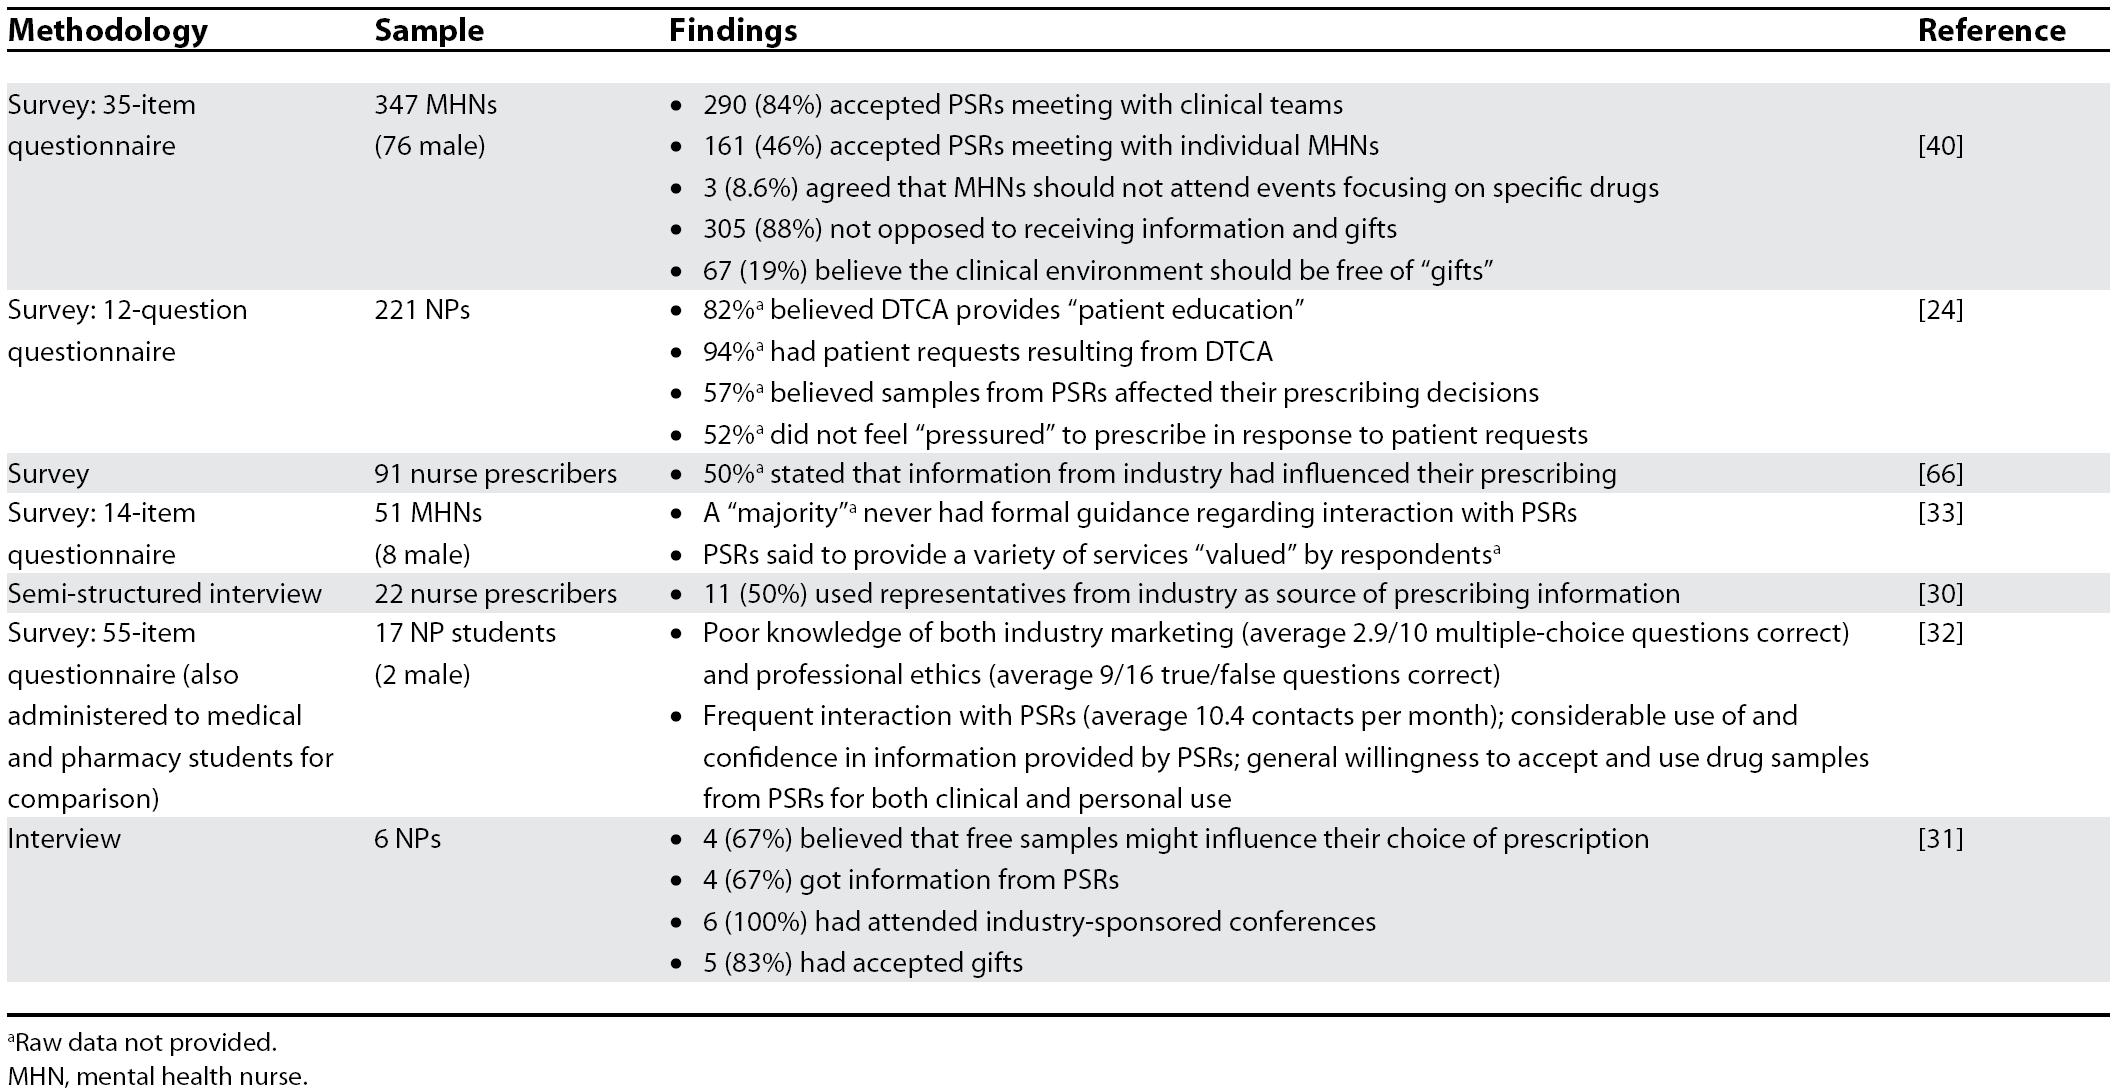 Summary of Empirical Findings Regarding Pharmaceutical Industry Influence on Nurses